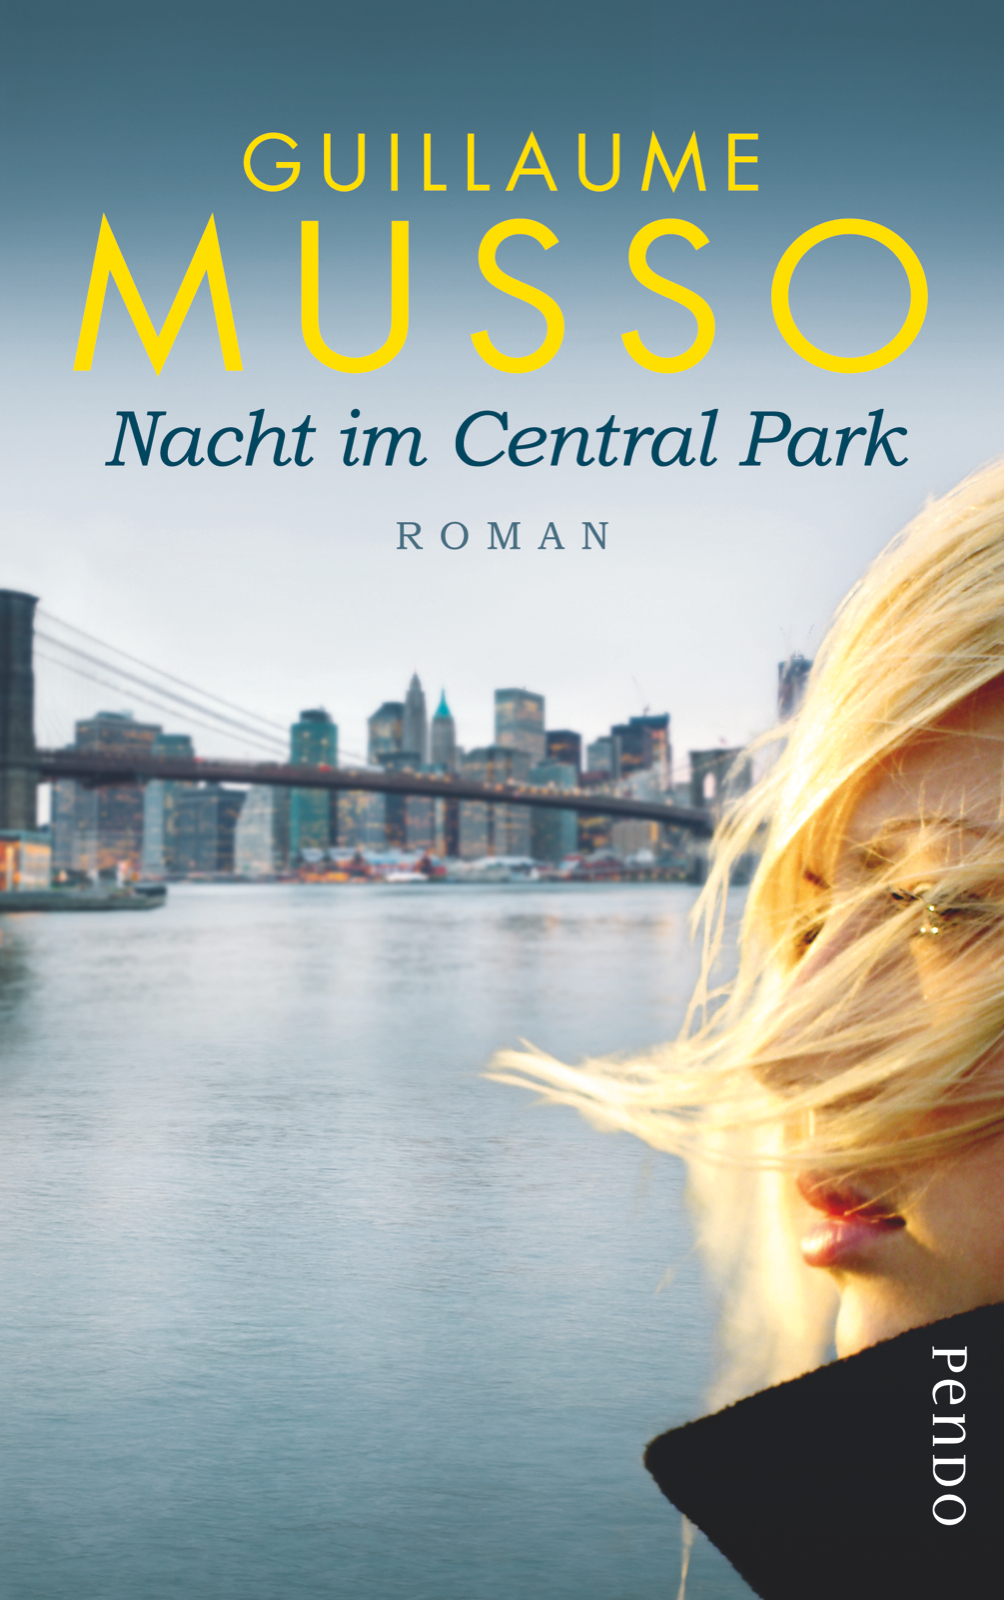 Nacht im Central Park von Guillaume Musso | Cover: Pendo Verlag / Piper Verlag